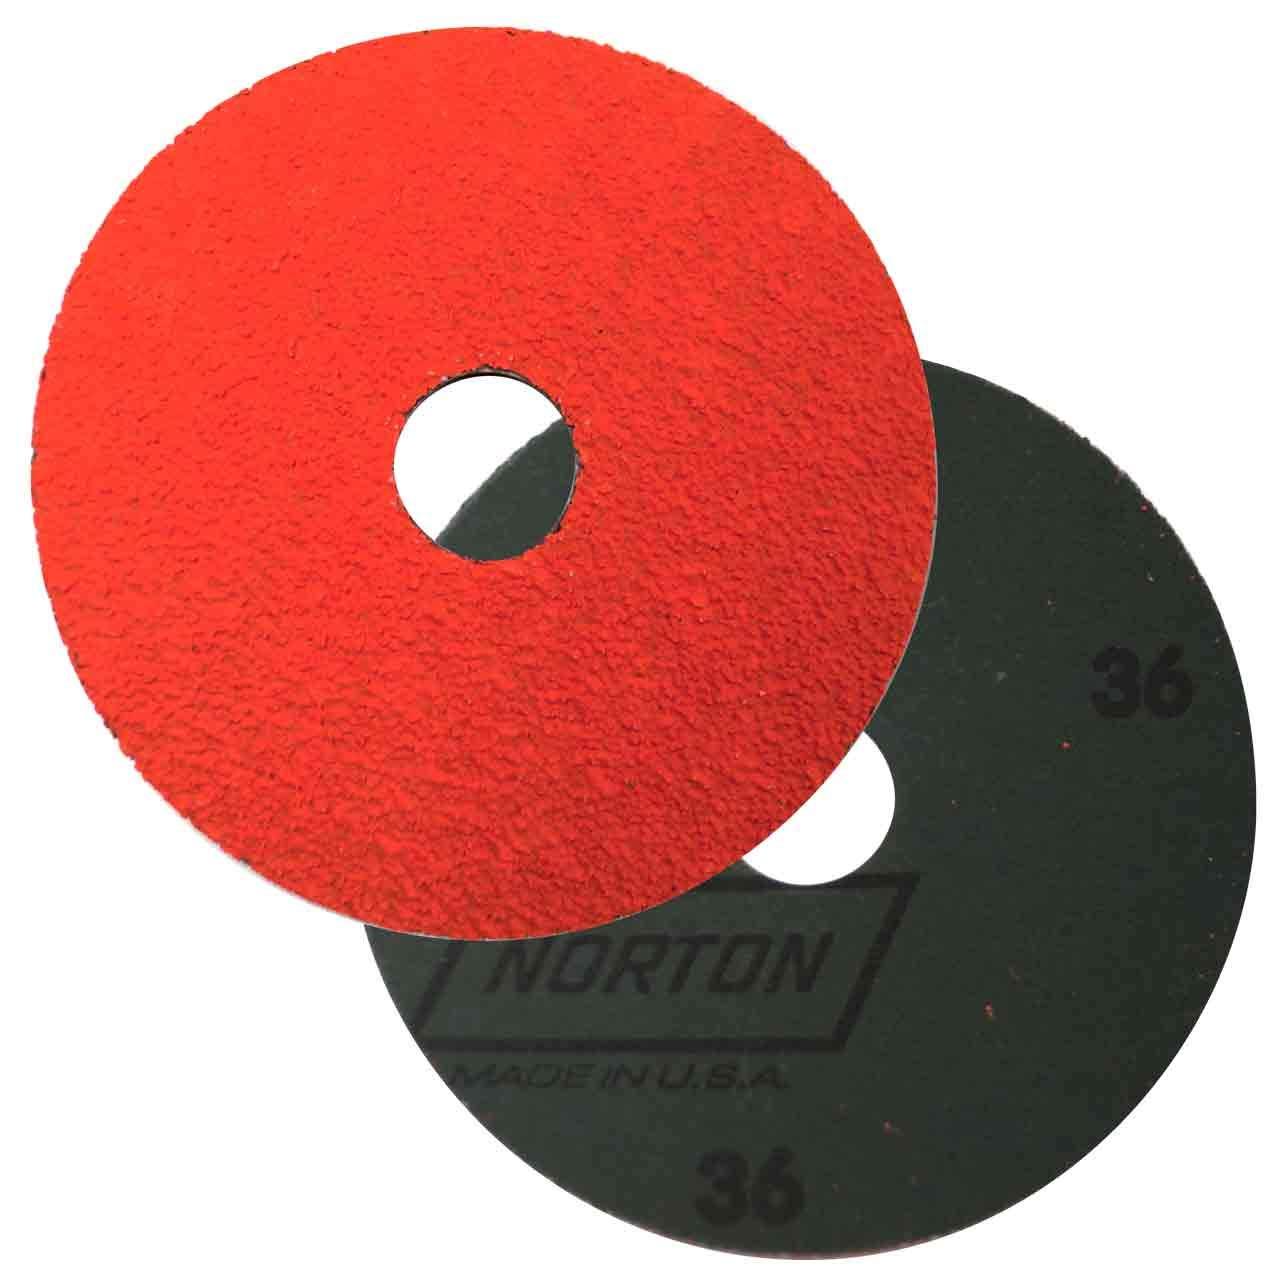 Norton SG Blaze F980 Abrasive Disc, Fiber Backing, Ceramic Aluminum Oxide, 7/8'' Arbor, 4-1/2'' Diameter, Grit 36 (Box of 25)